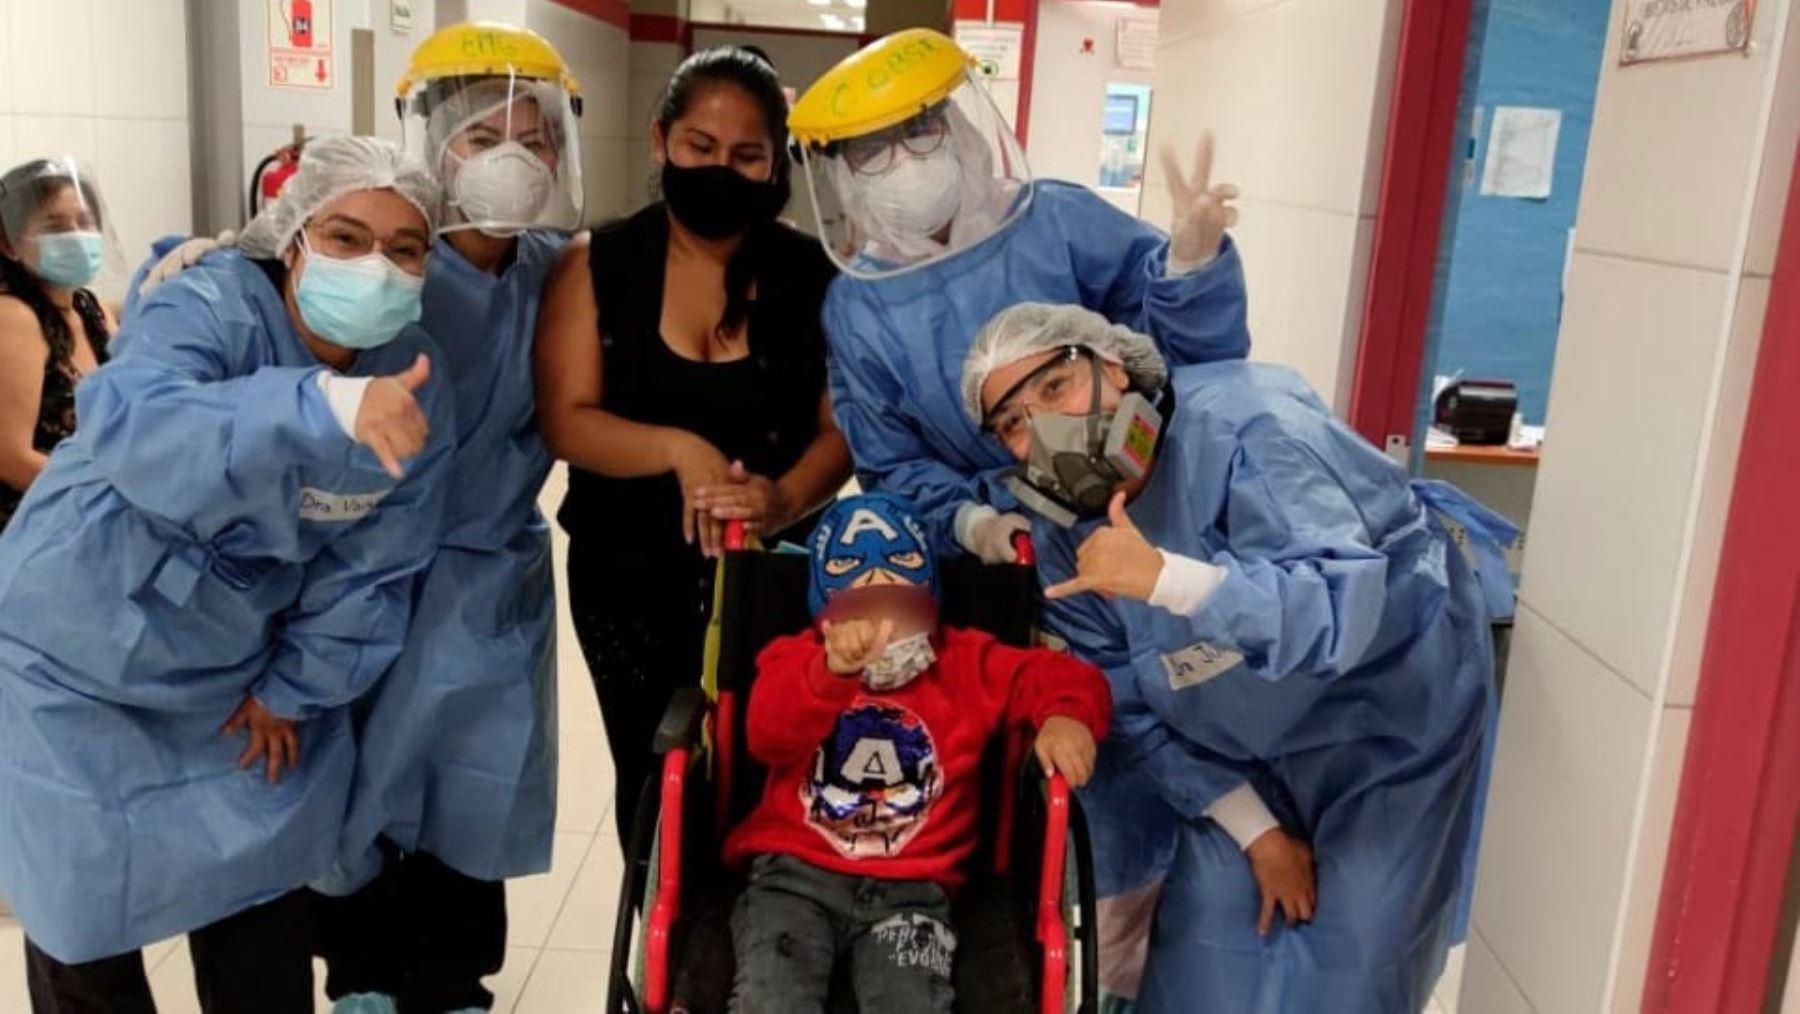 cirujanos-salvan-la-vida-de-nino-tras-compleja-operacion-neurologica